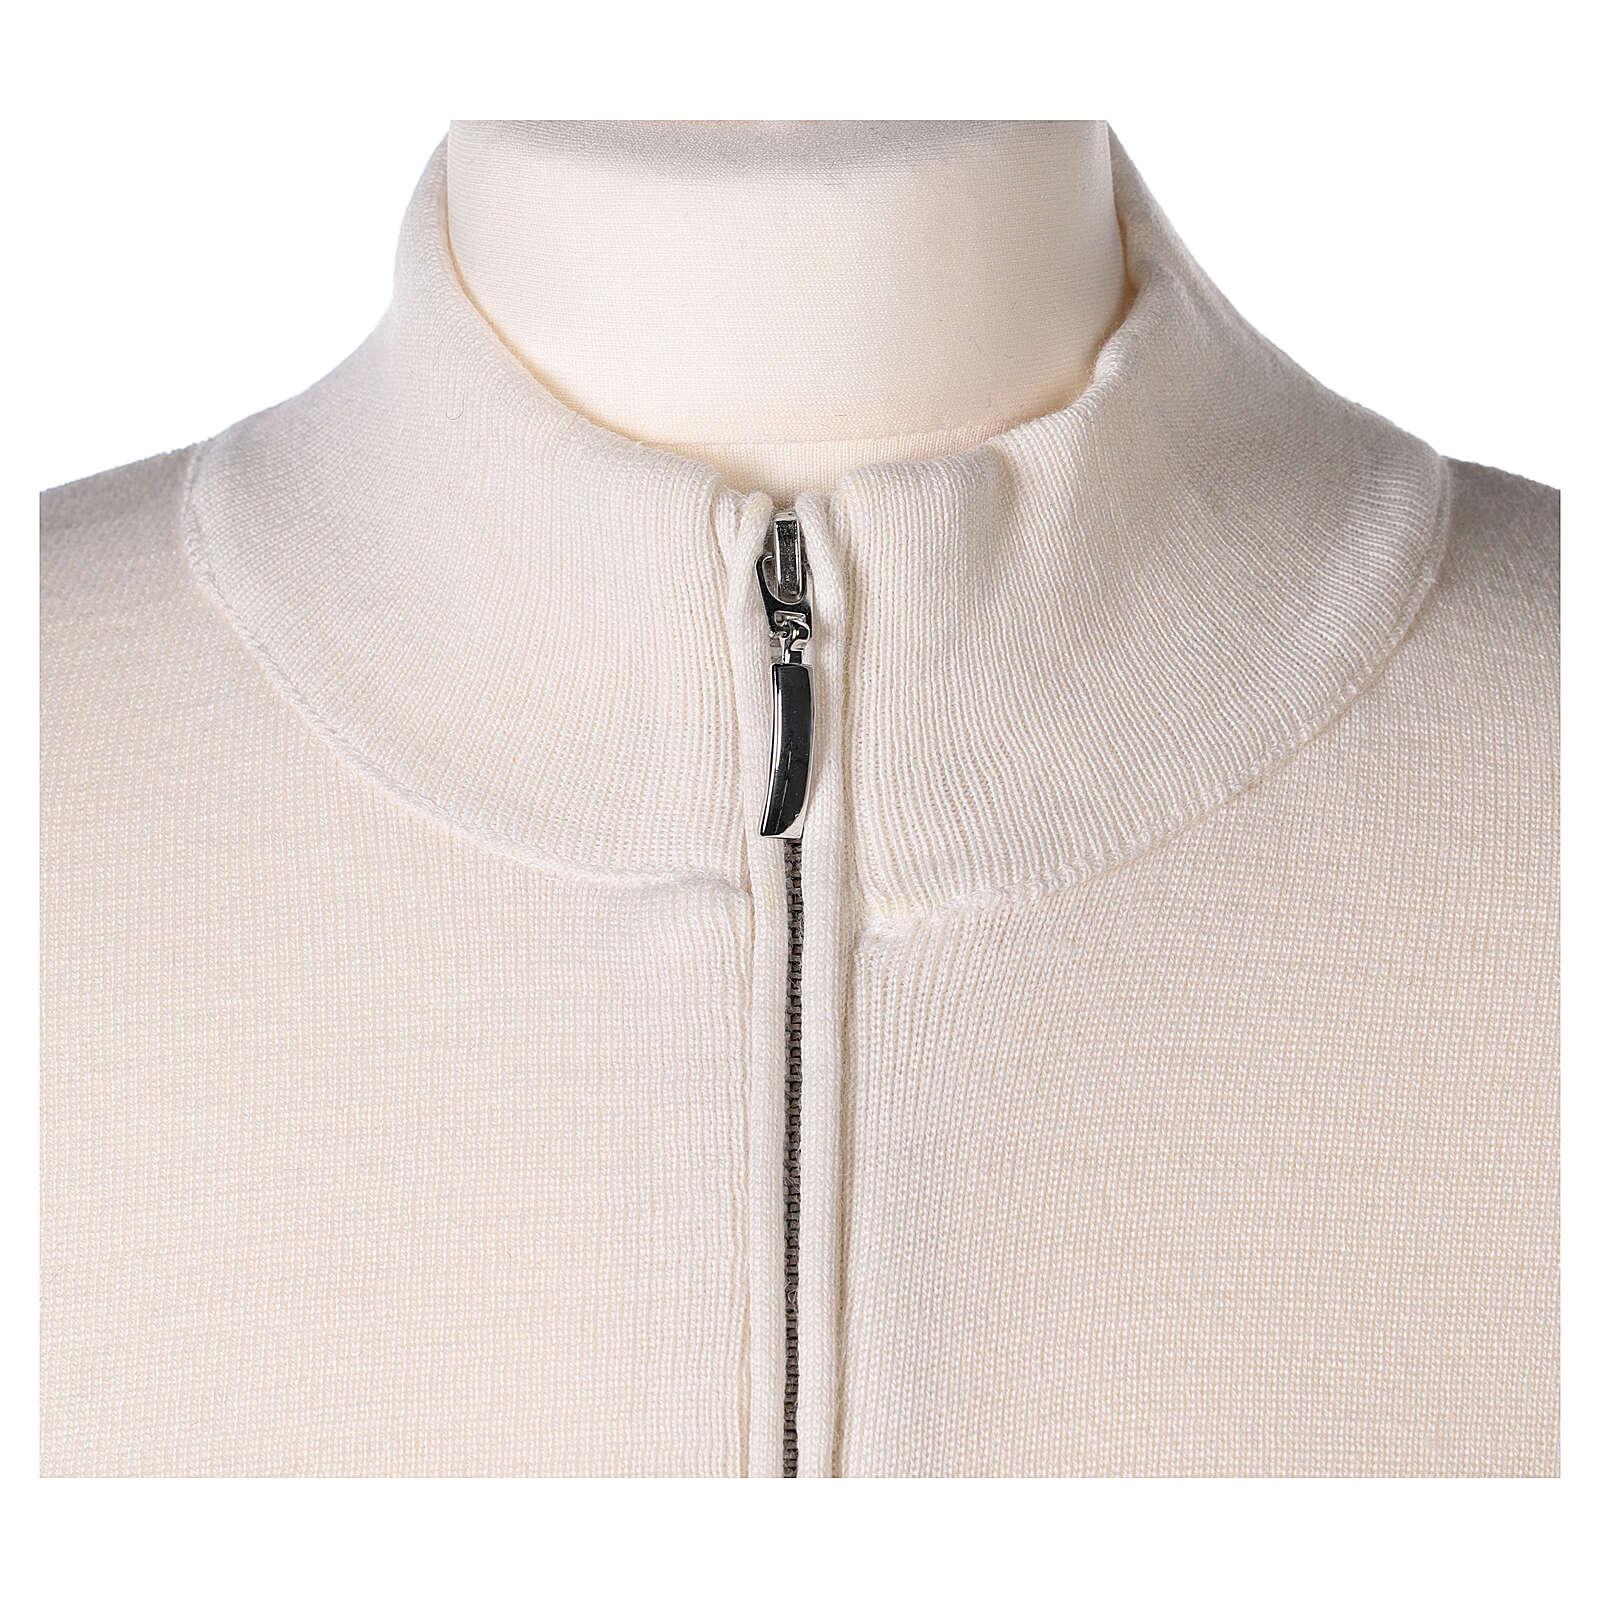 Chaqueta coreana con cremallera 50% acrílico 50% lana merina blanca monja In Primis 4